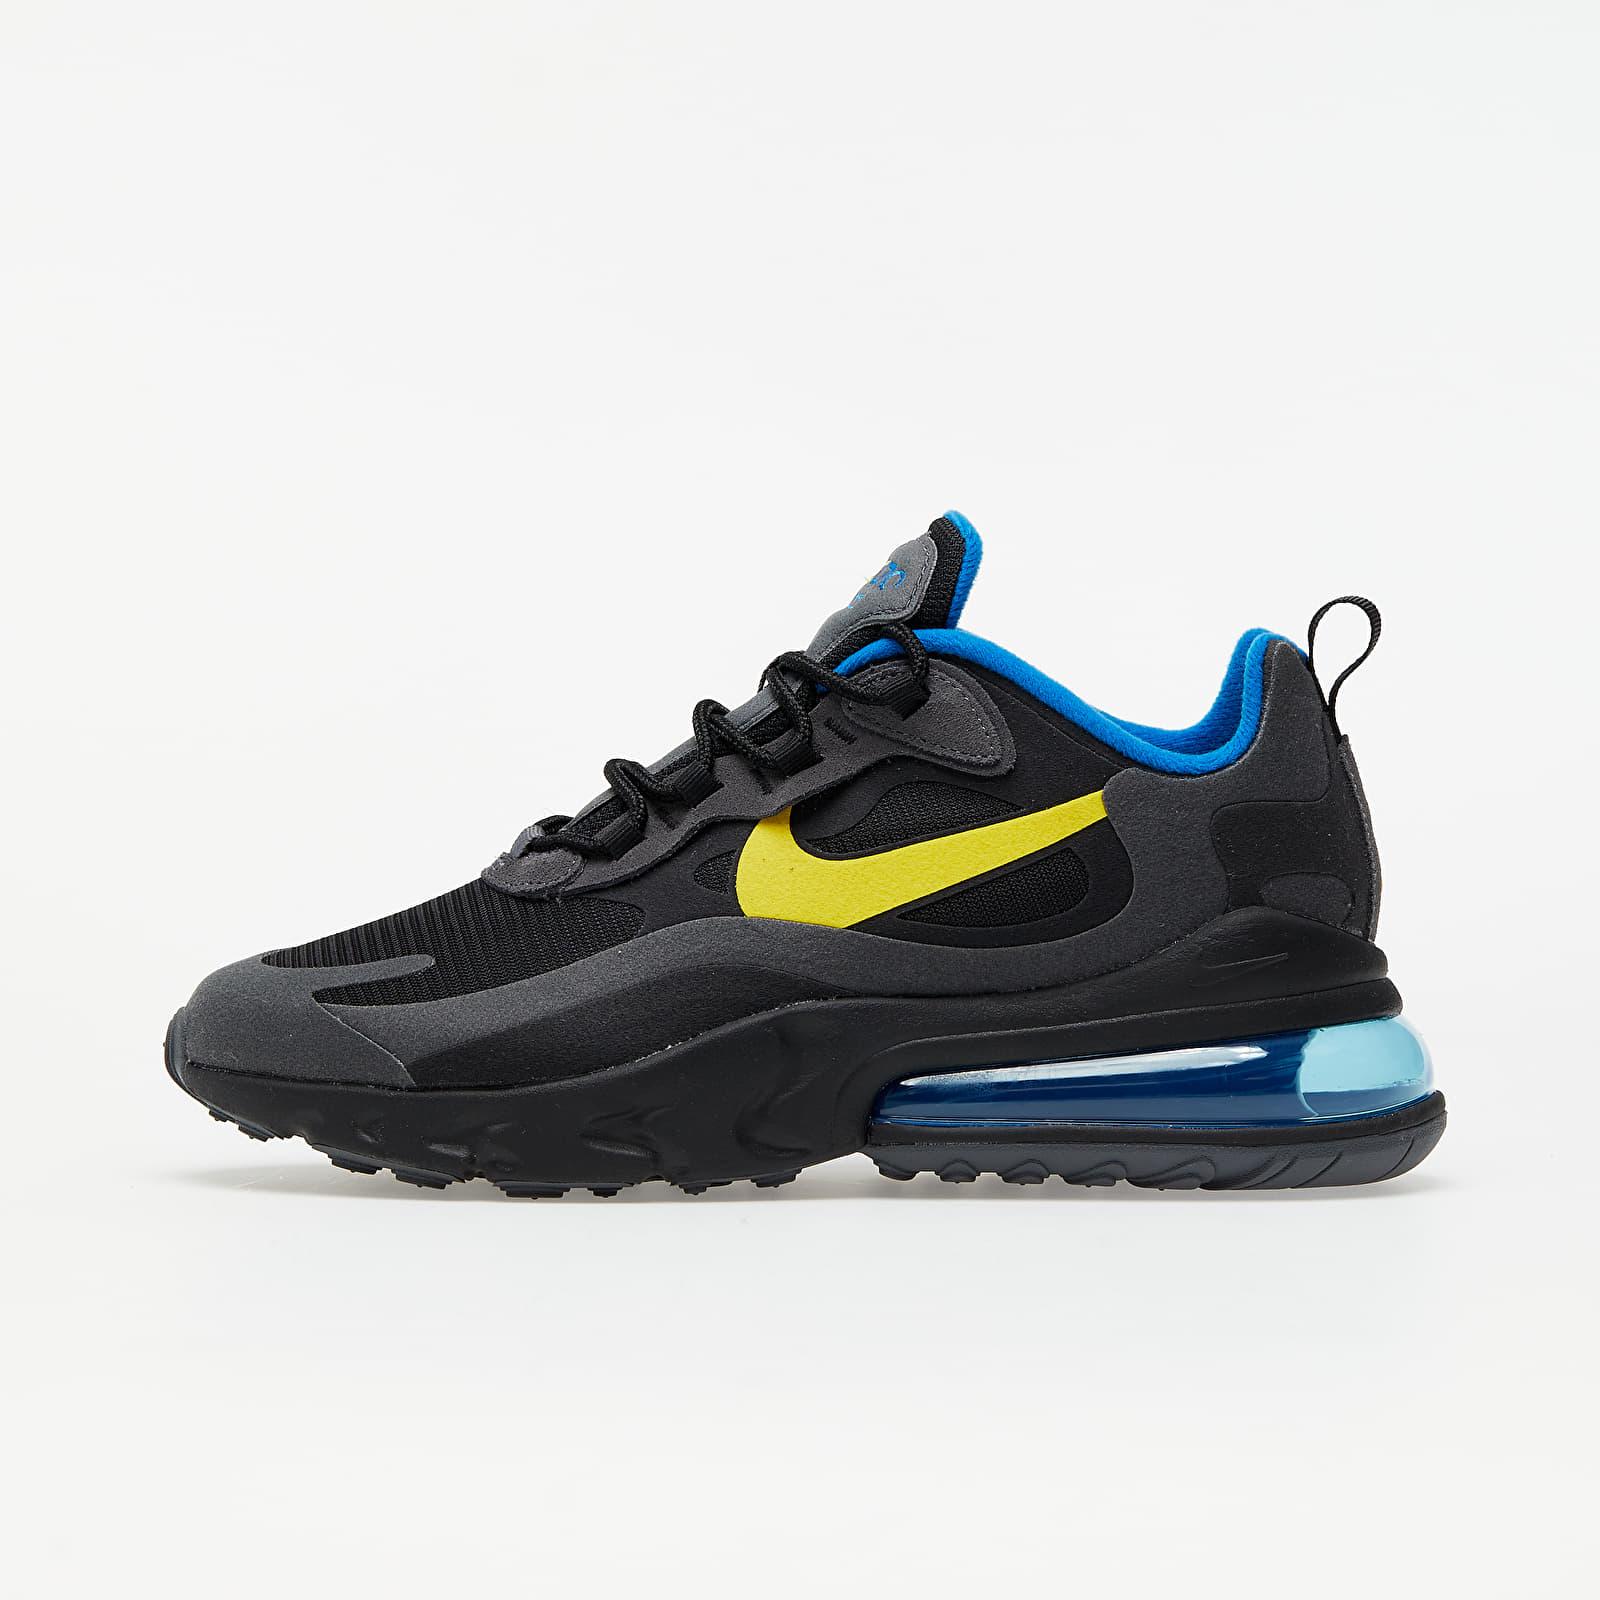 Chaussures et baskets homme Nike Air Max 270 React Black/ Tour Yellow-Dark Grey-Blue Spark